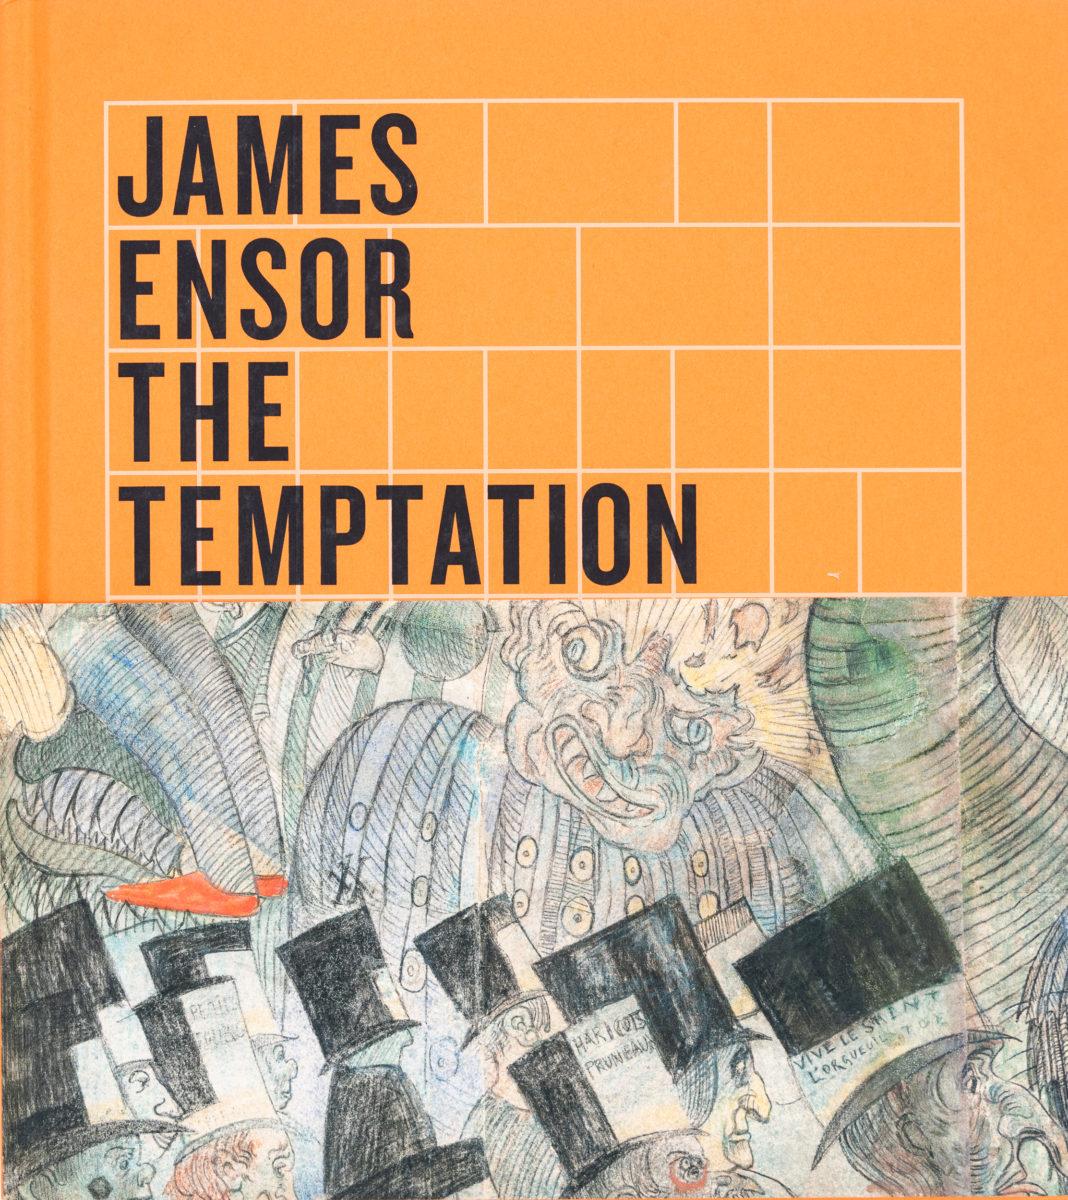 James Ensor, The Temptation